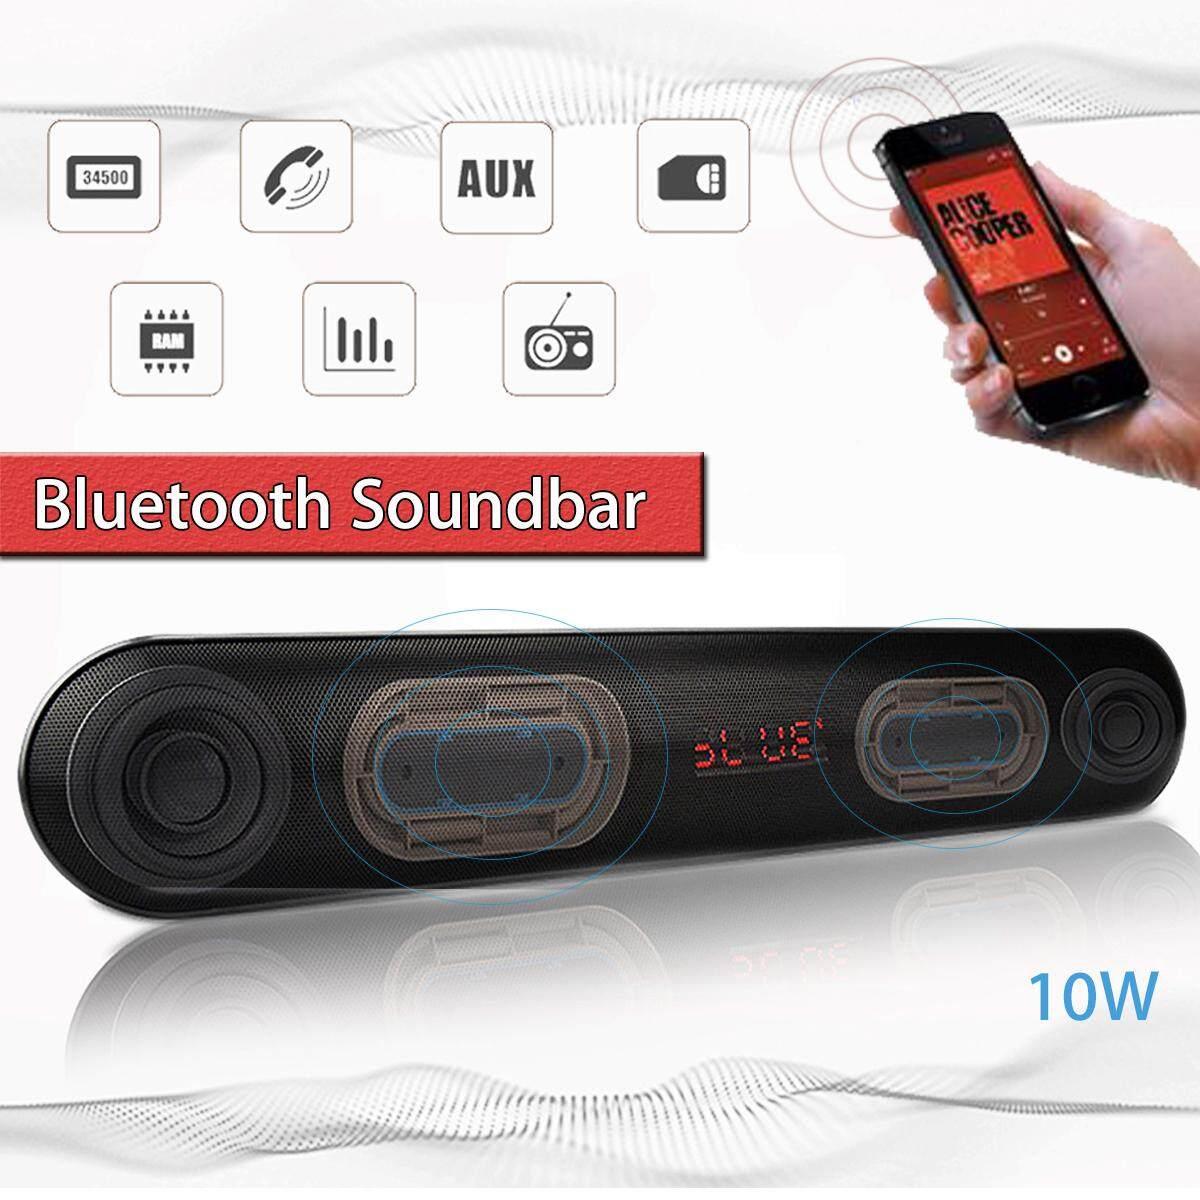 bluetooth TV Soundbar Wireless Stereo Speaker Home Theater +Subwoofer USB/TF/AUX - intl